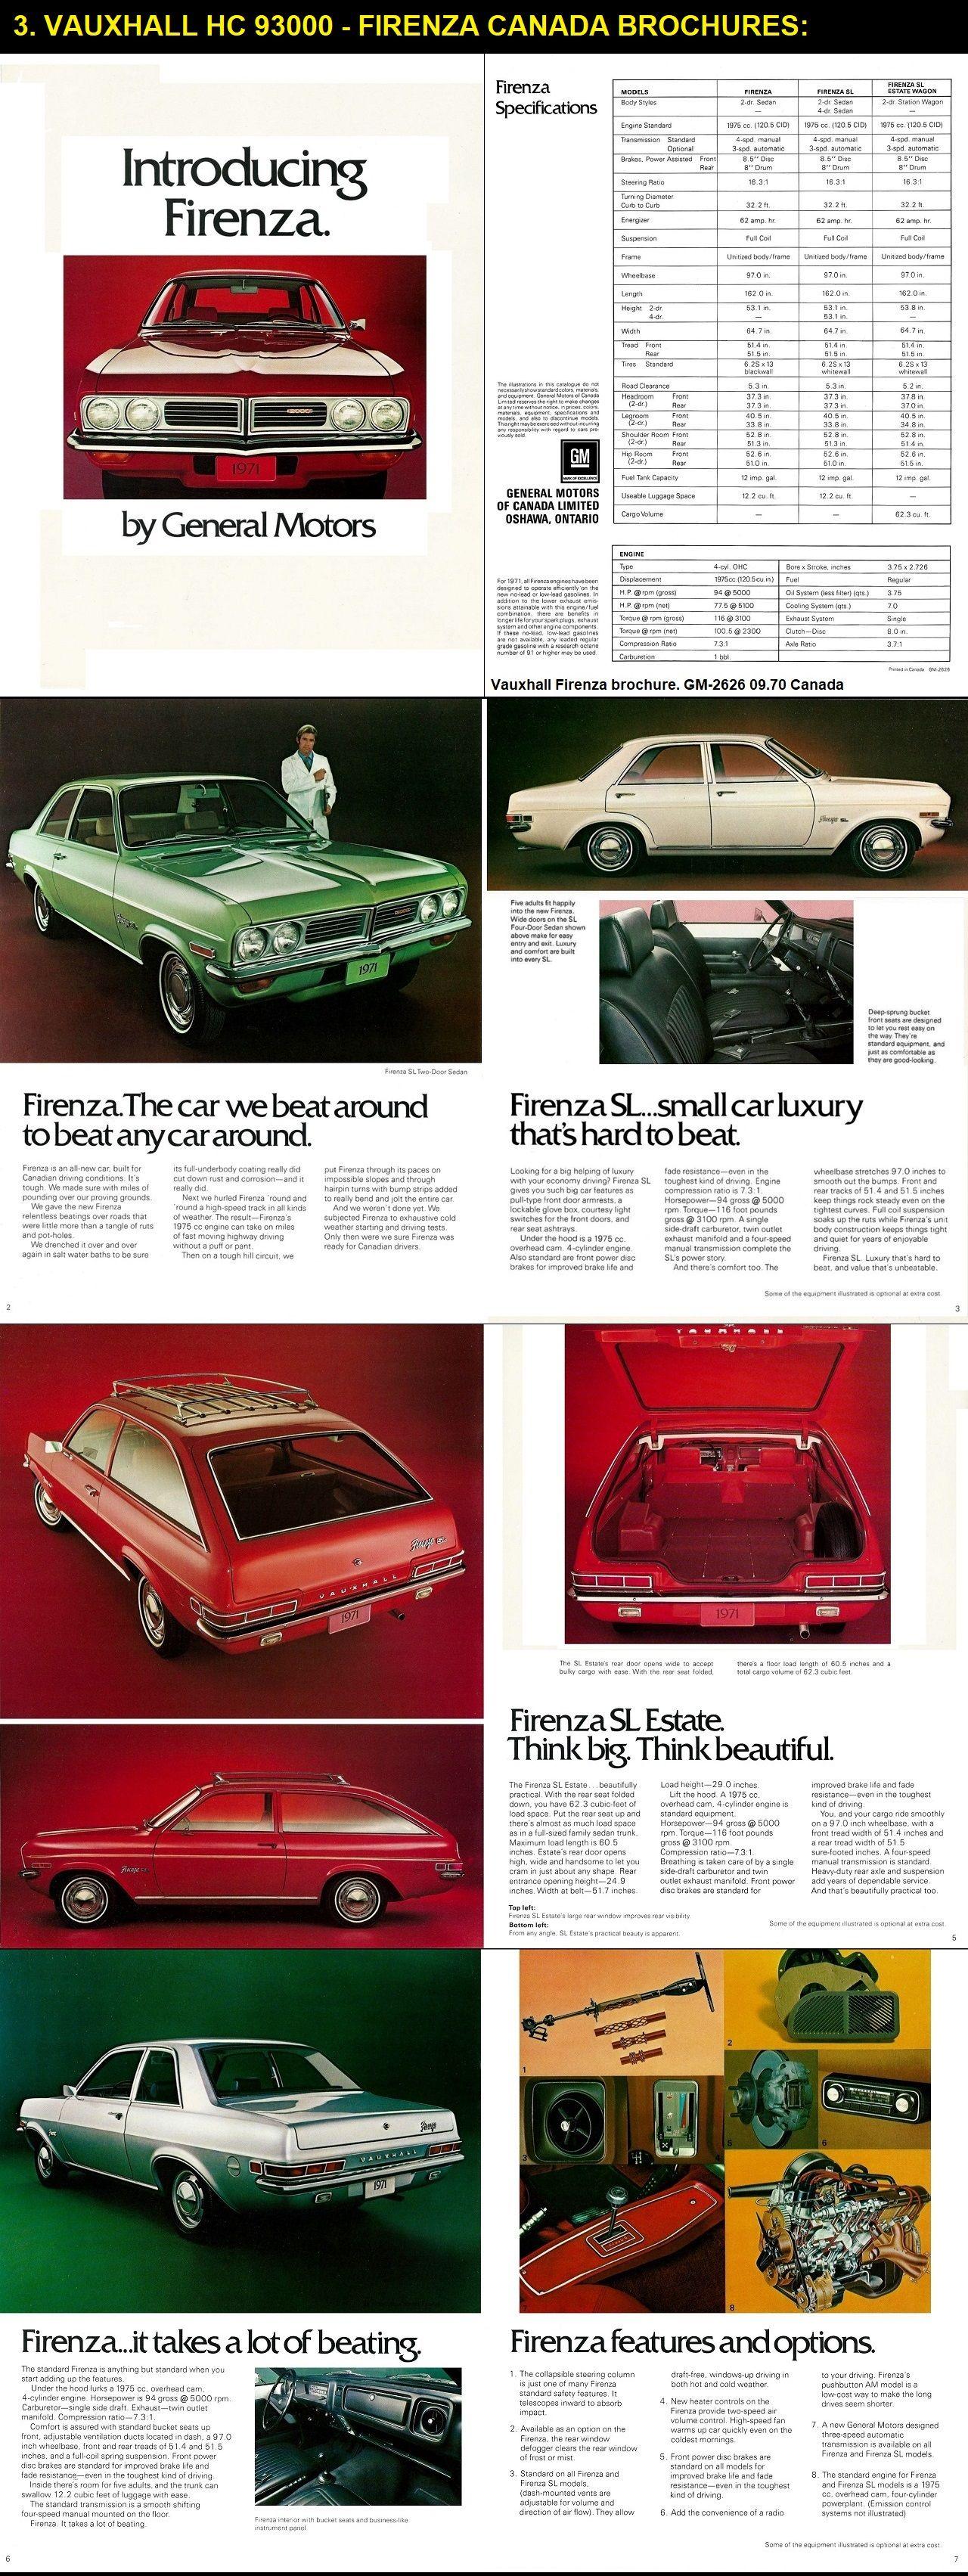 Pin by Veli Korkiakoski on GM EU/UK Opel/Vauxhall | Pinterest | Car ...